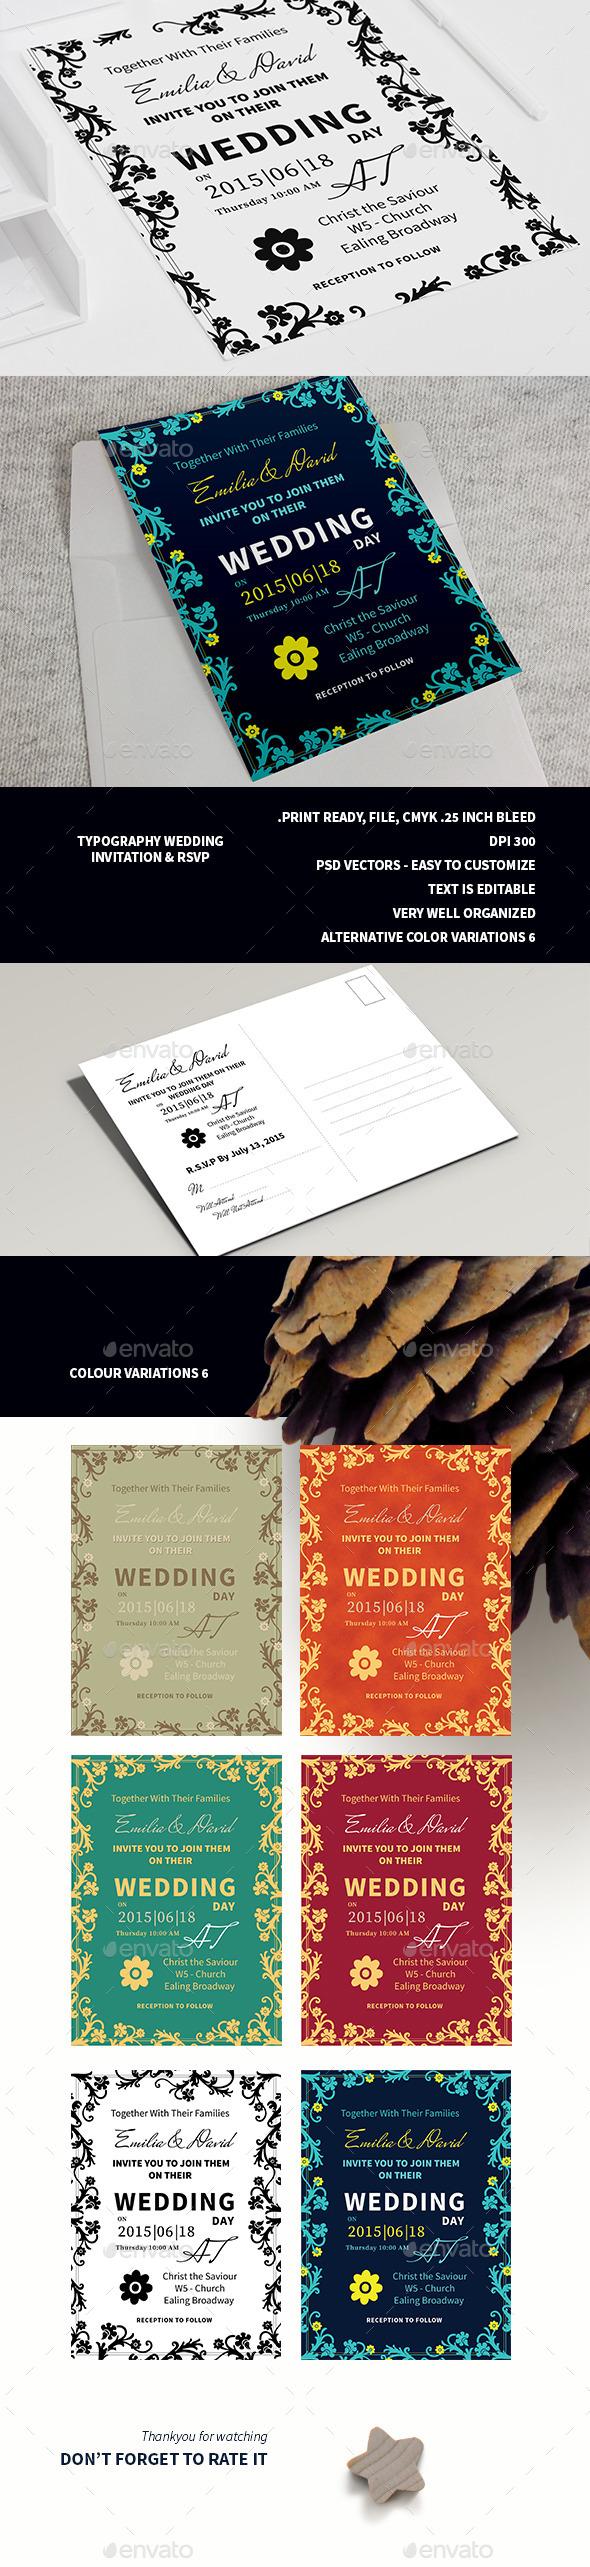 Typography Wedding Invitation & RSVP  - Weddings Cards & Invites